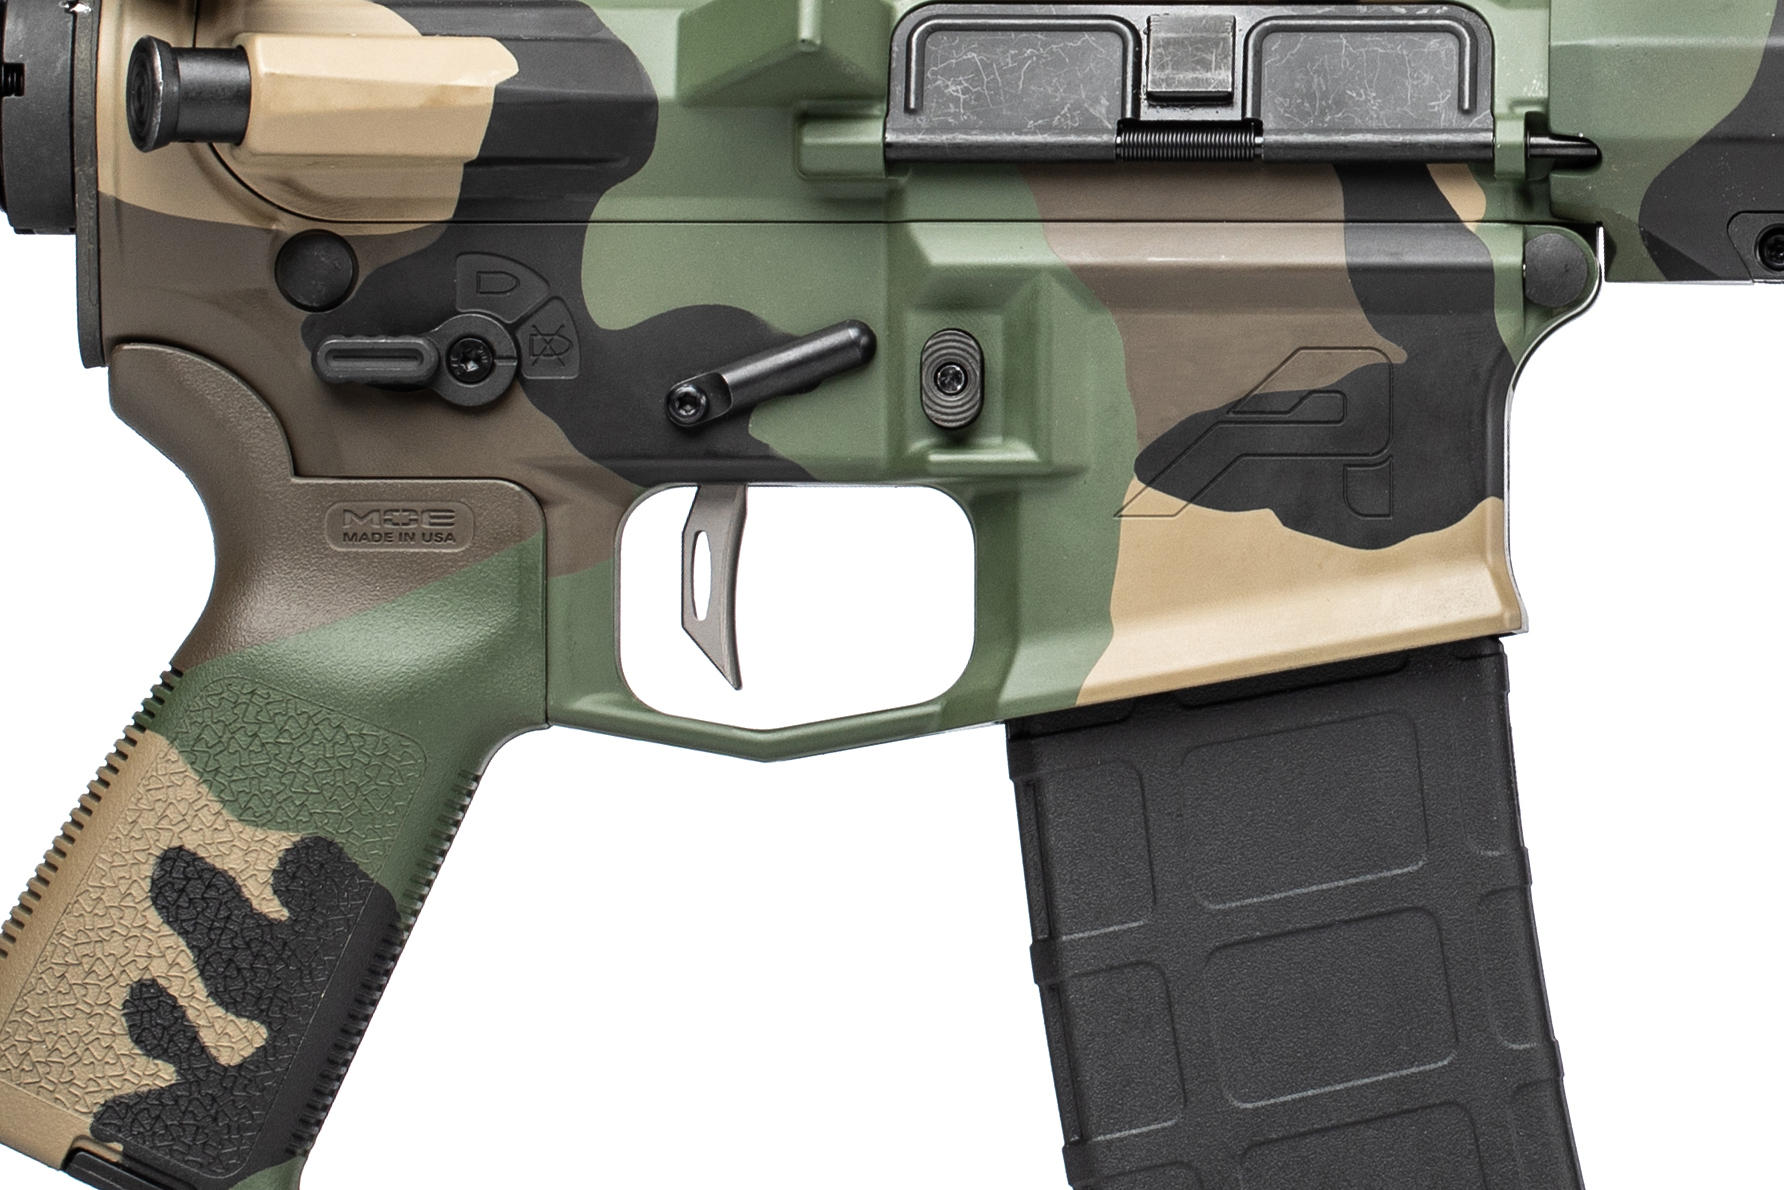 RA-535 Trigger